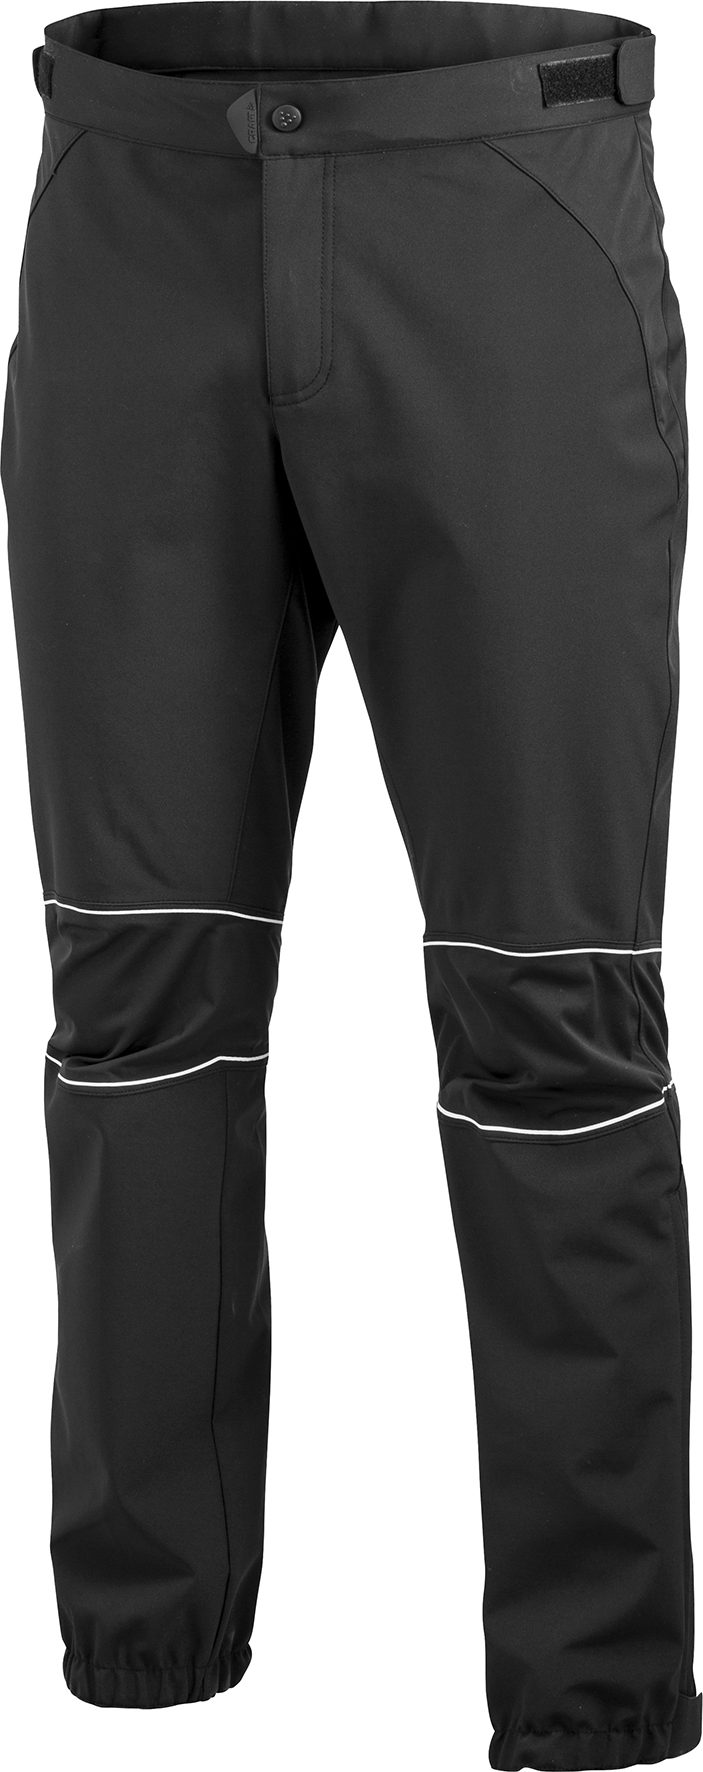 Лыжные брюки Craft PXC Crossover мужские